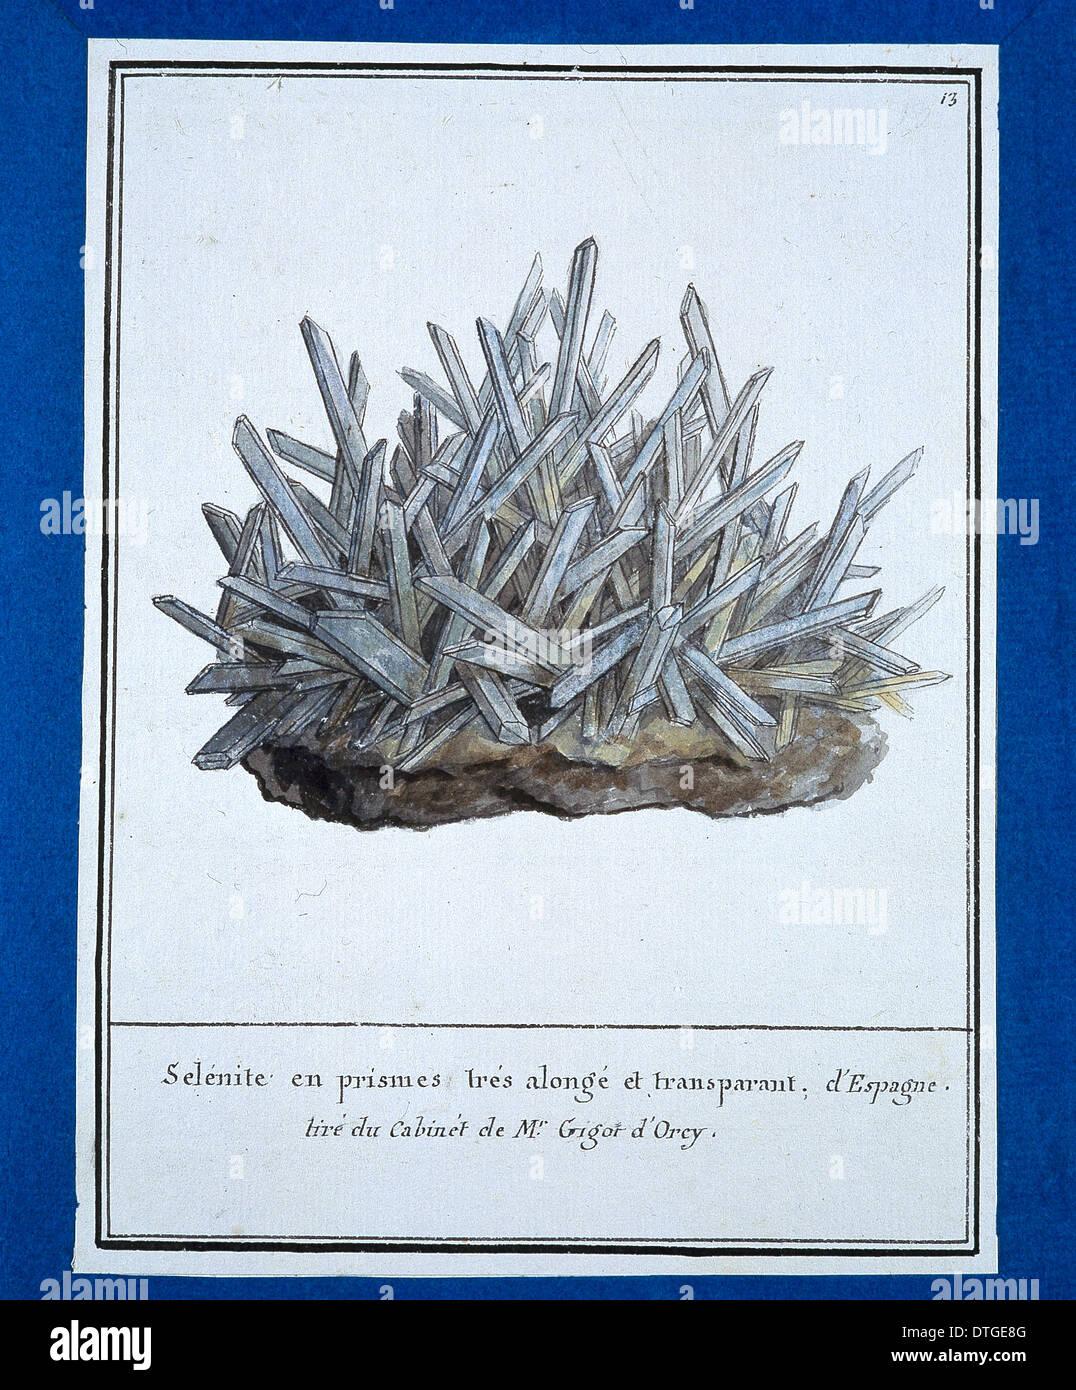 Lámina 13 de mineralogie Volumen 1 (1790) por Desfontaines Swebach Imagen De Stock